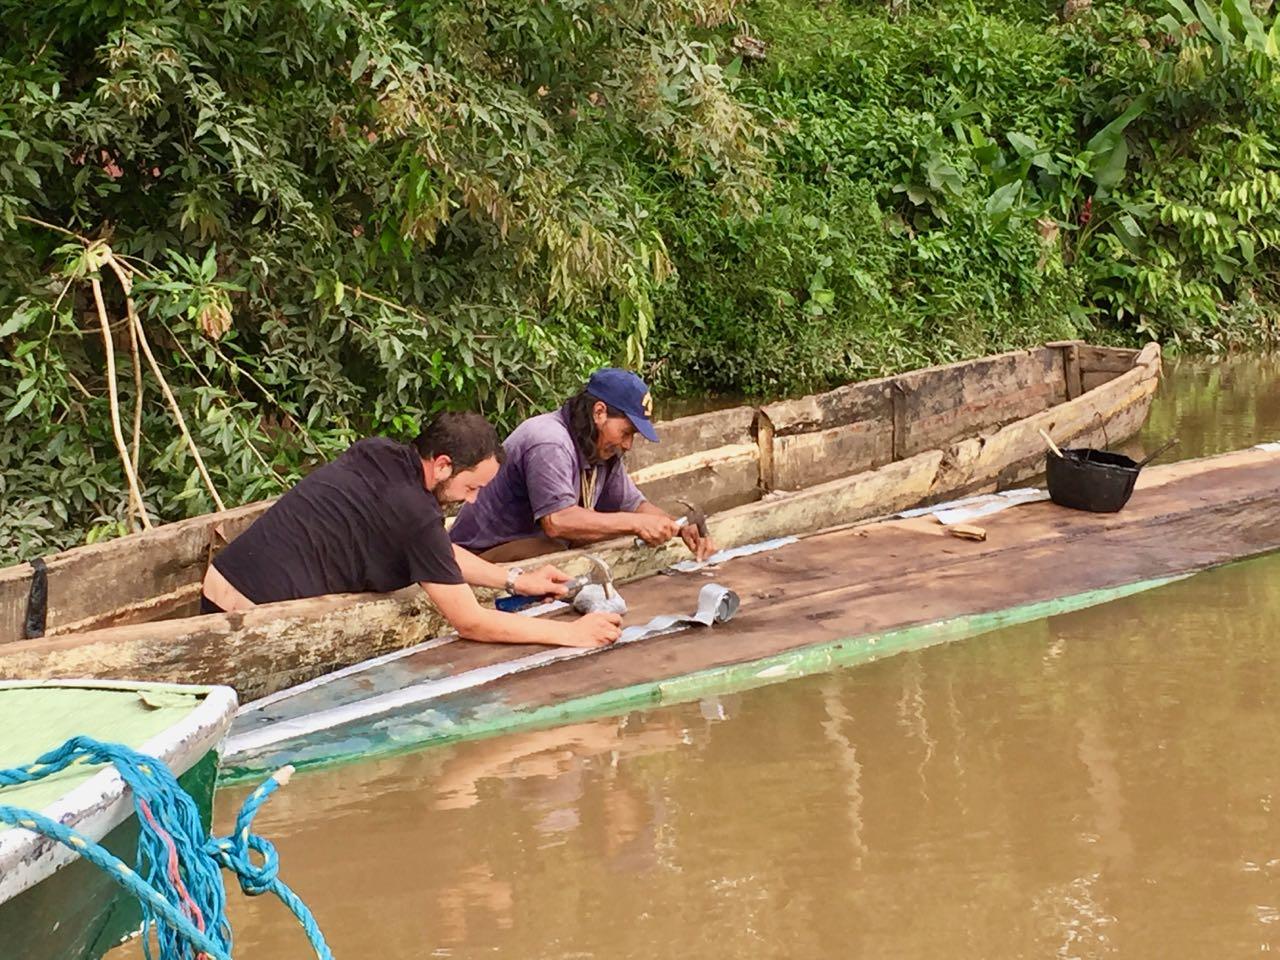 Hifi hilft beim Boot reparieren.